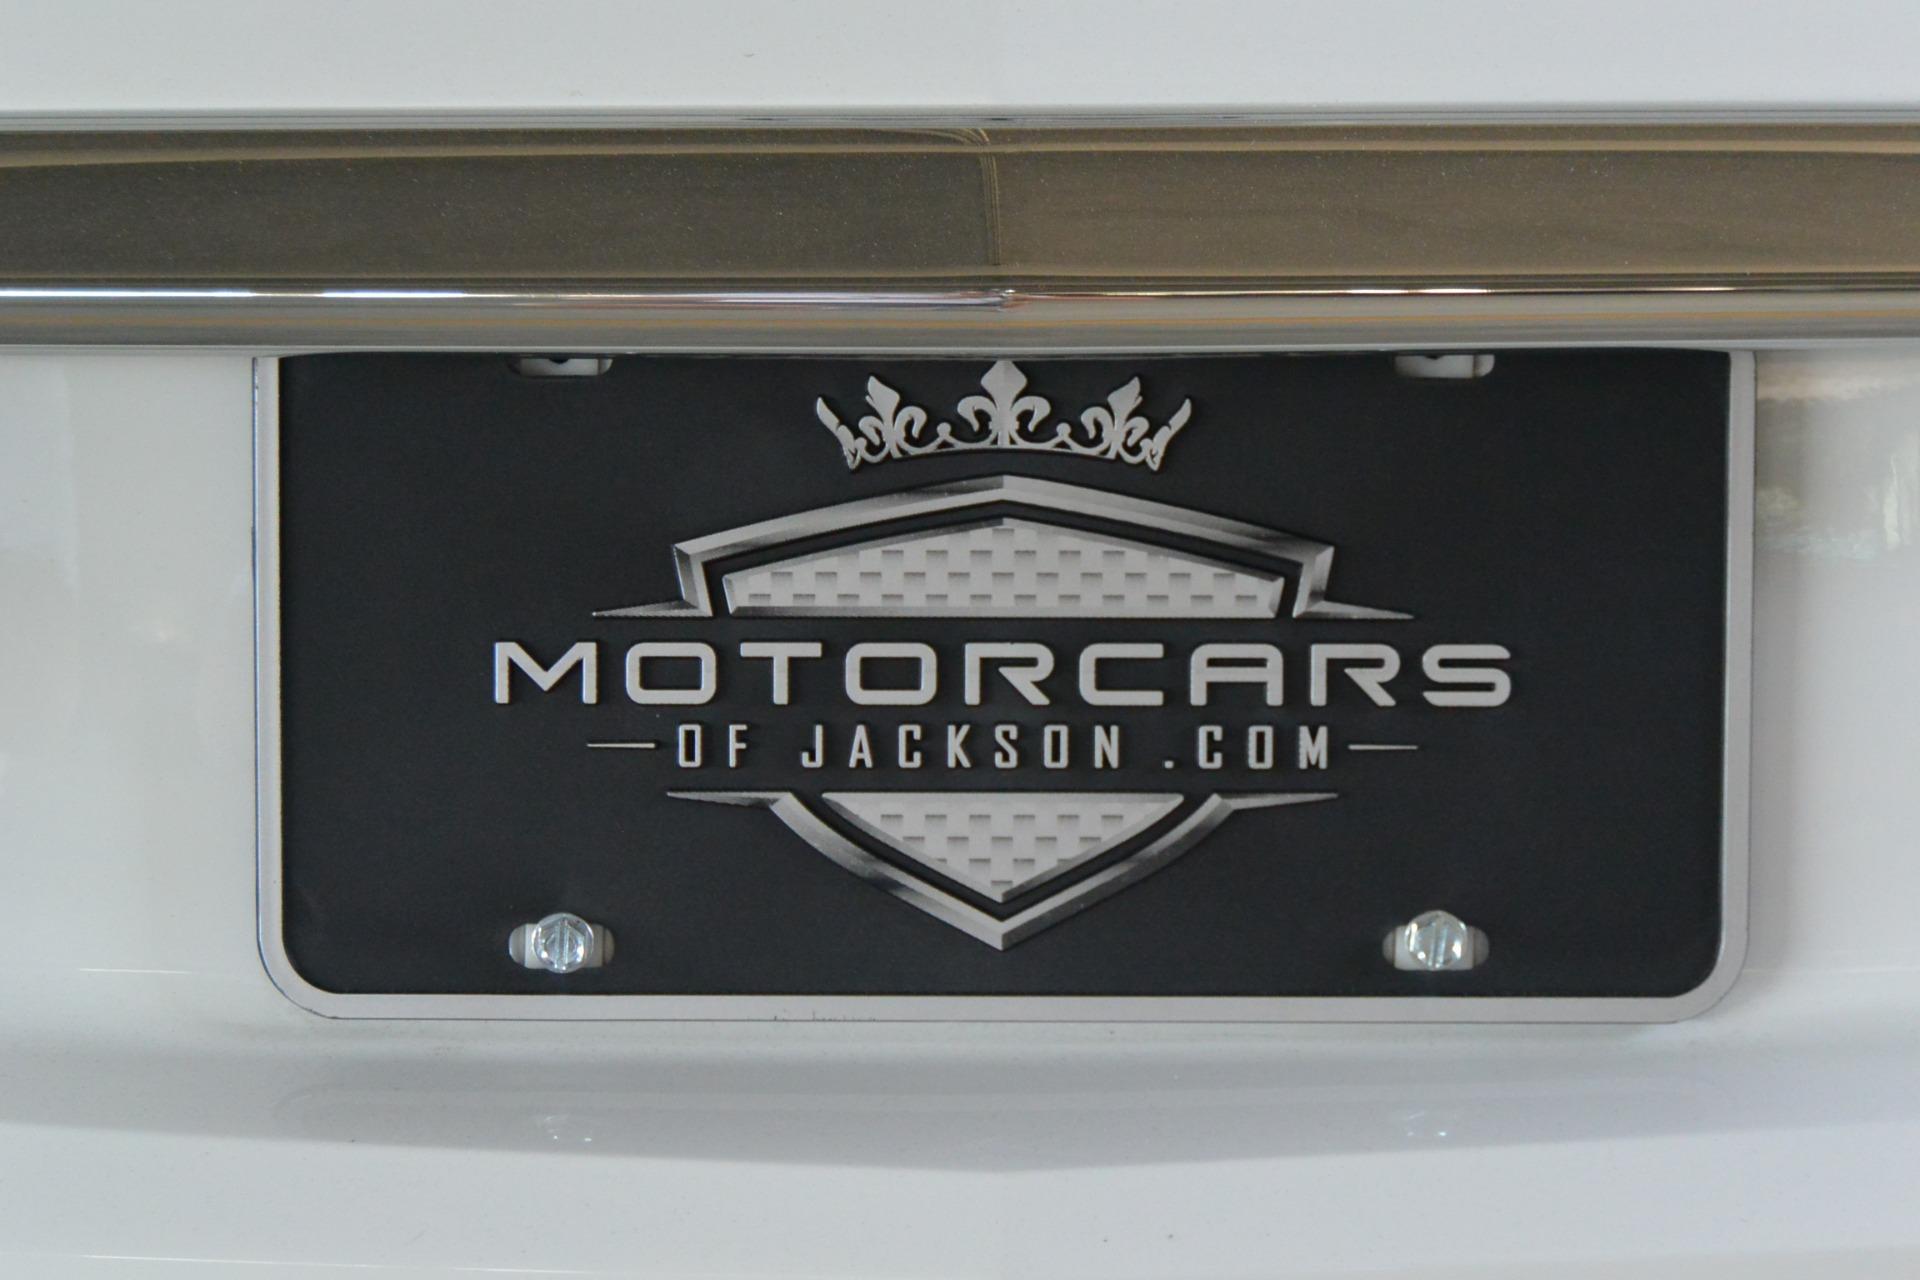 2010 chevrolet camaro 2ss 69 retro show car stock c9200828 for sale near jackson ms ms. Black Bedroom Furniture Sets. Home Design Ideas